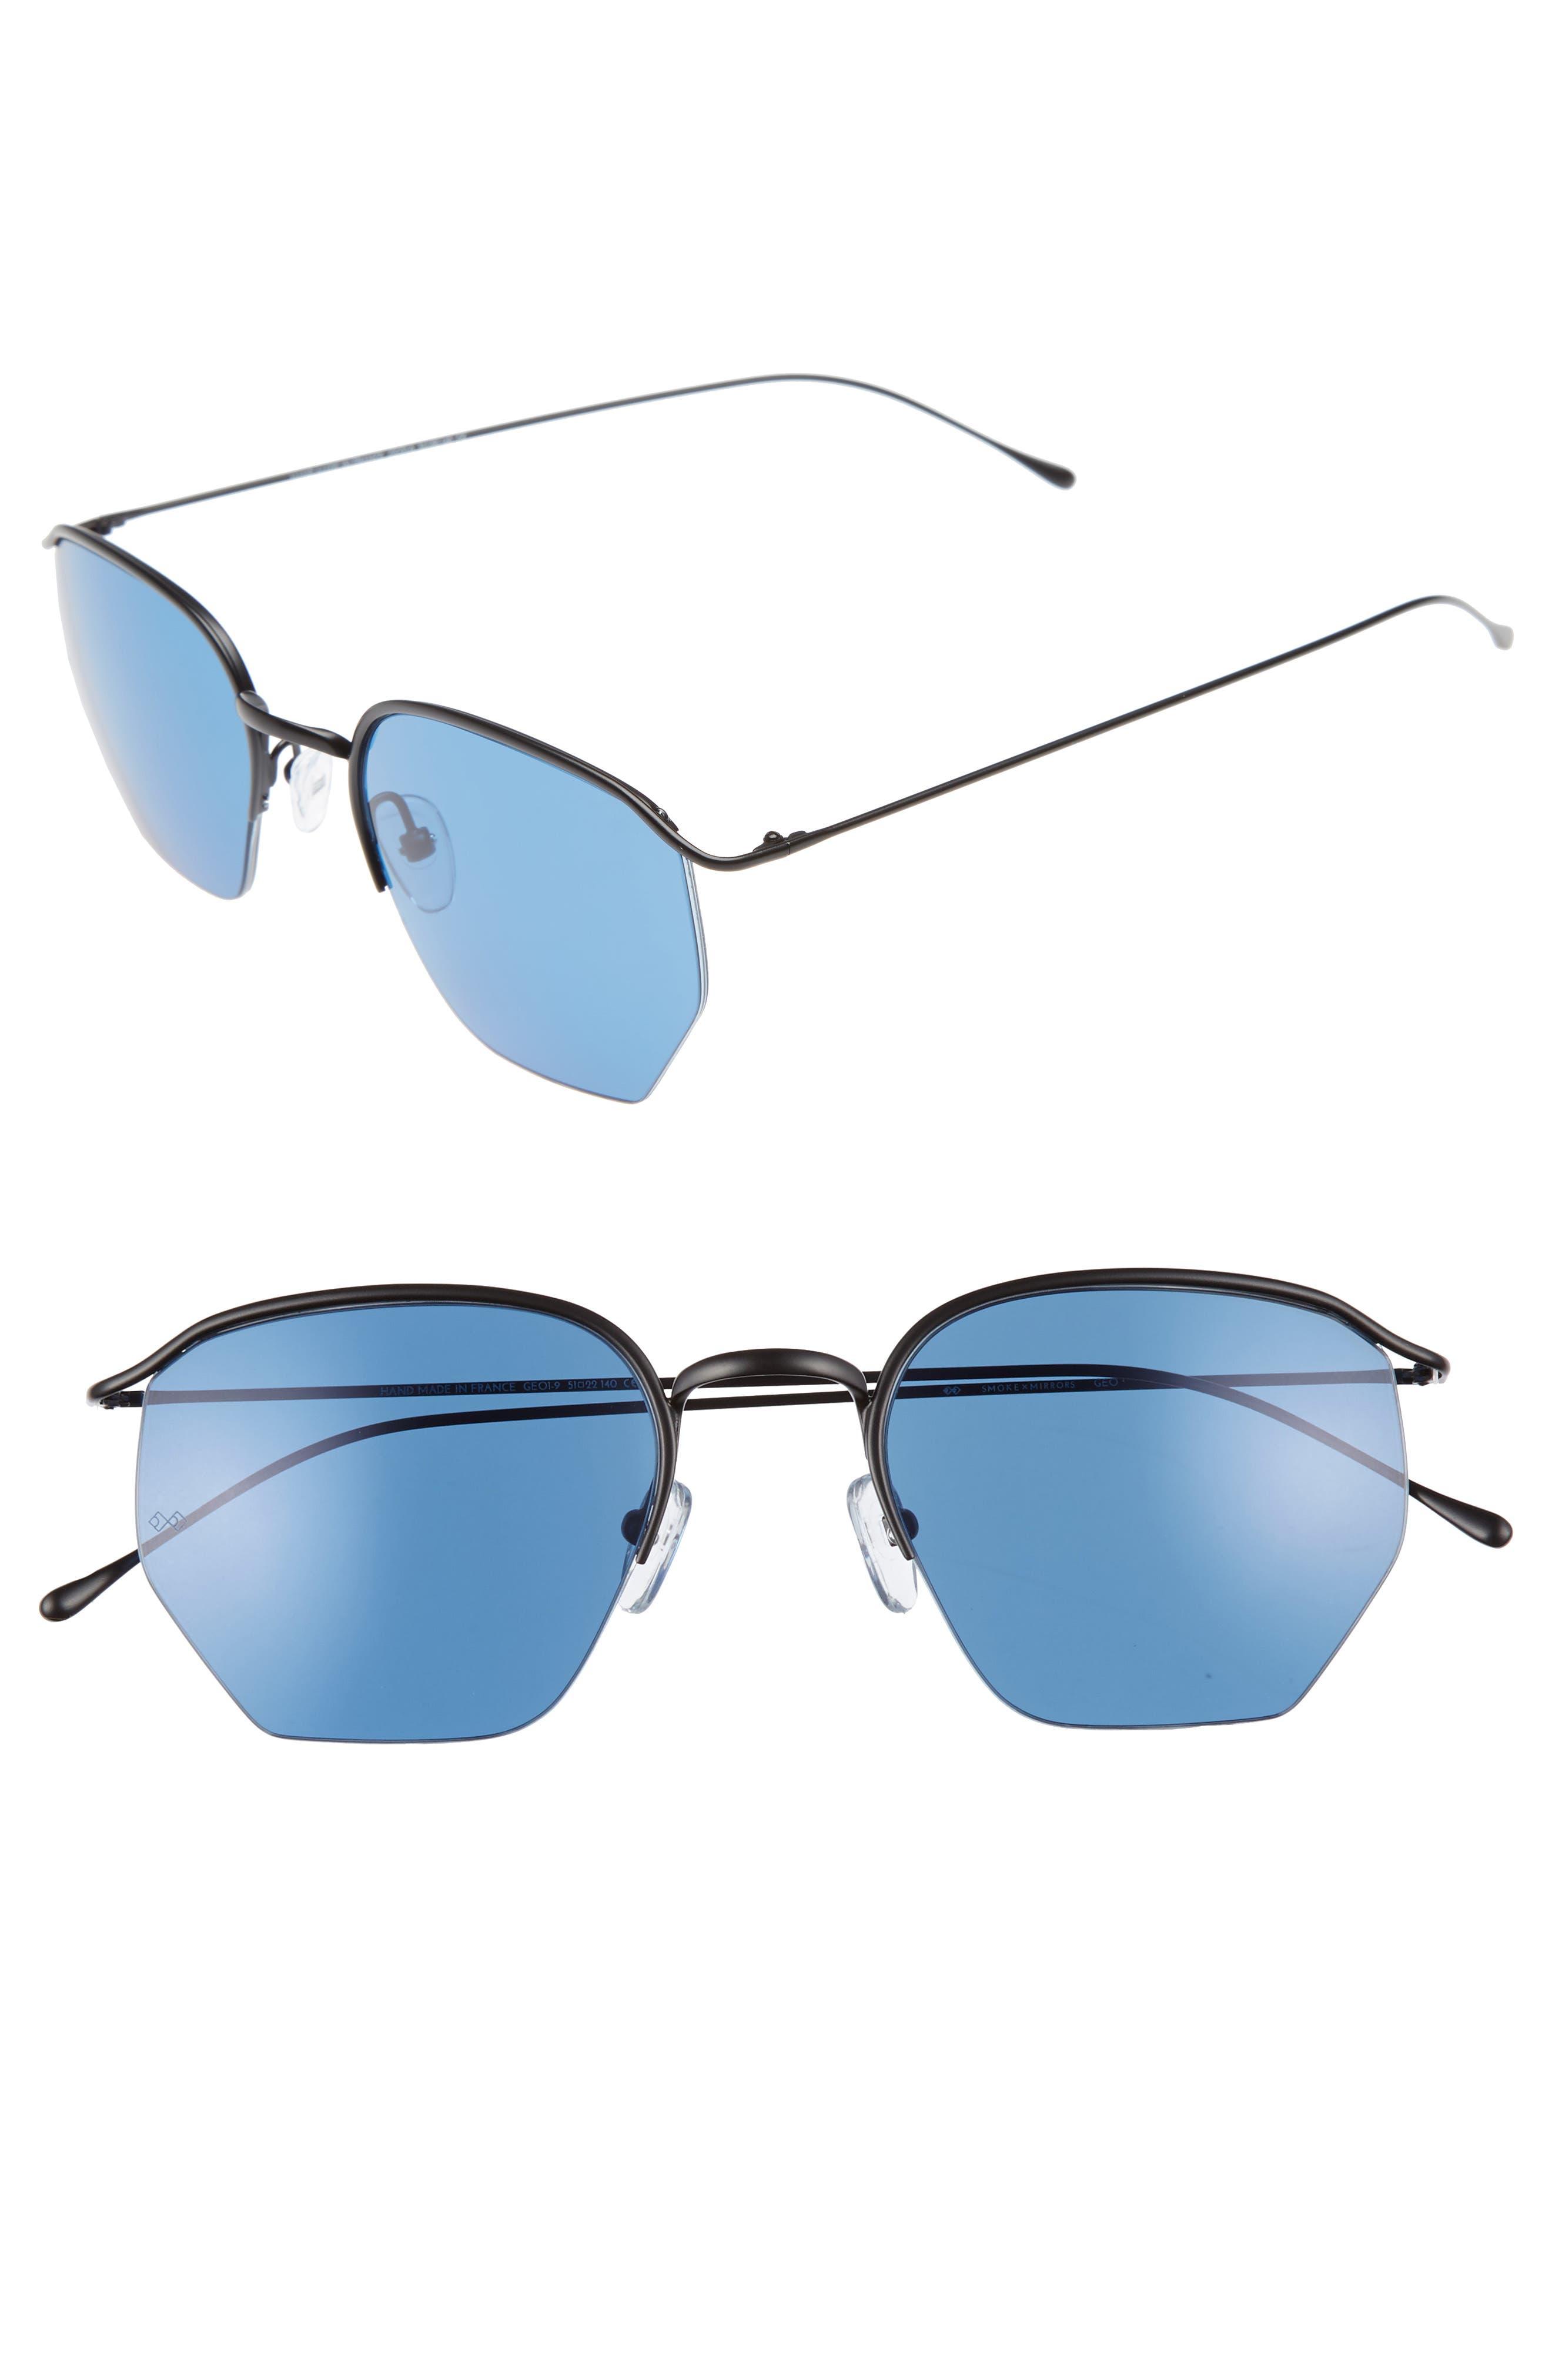 Geo 1 50mm Aviator Sunglasses,                         Main,                         color, MATTE BLACK/ GRADIENT BLUE